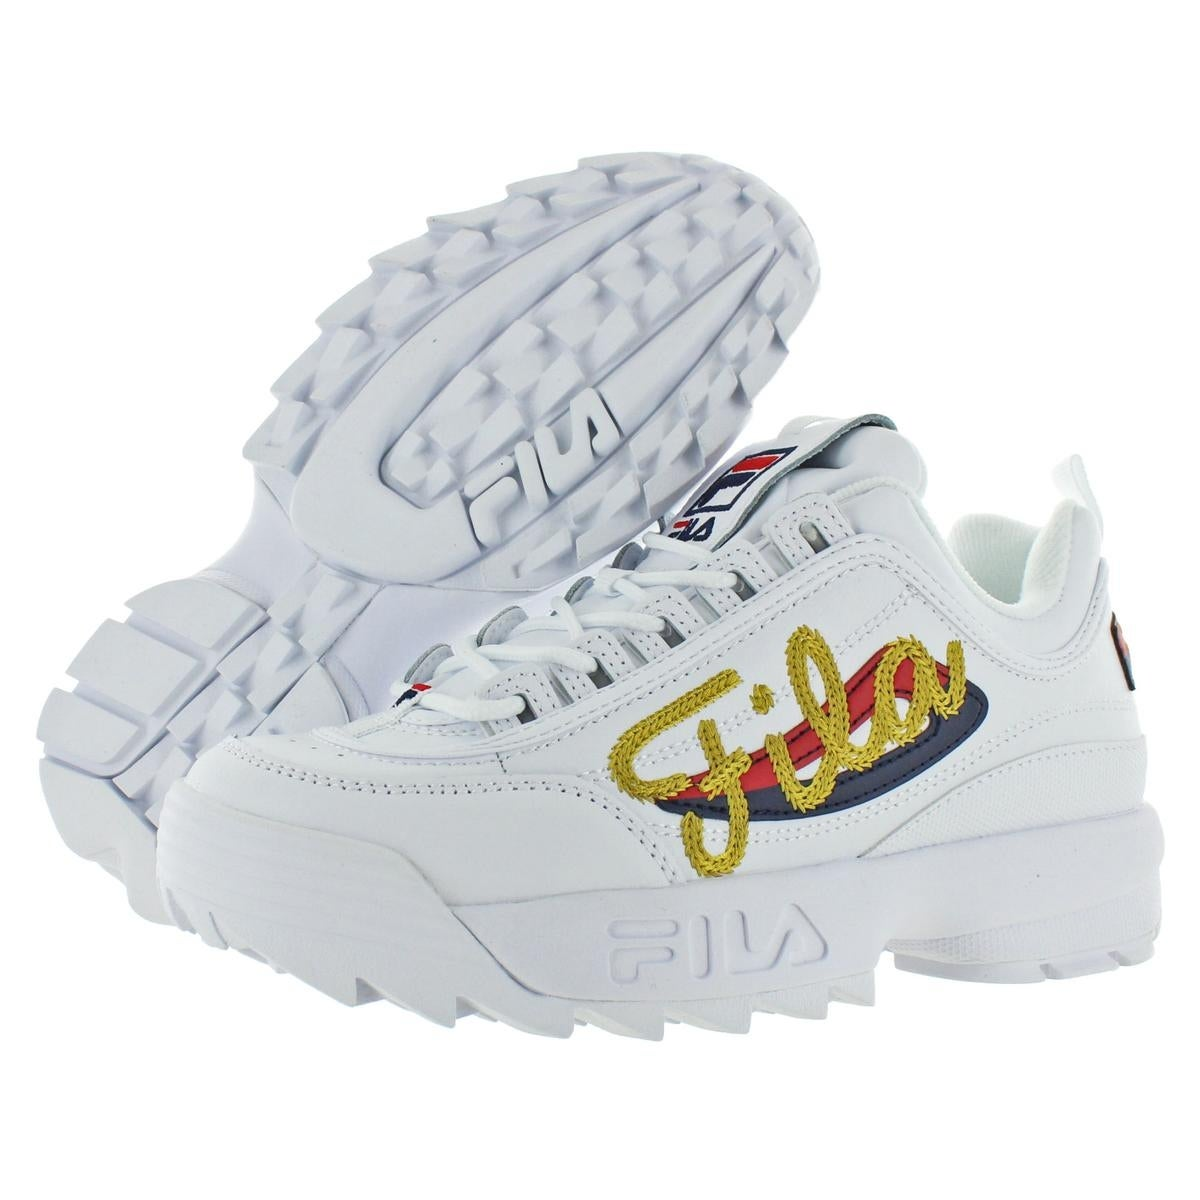 c4395107439 Fila Womens Disruptor II Signature Fashion Sneakers Leather Padded Insole